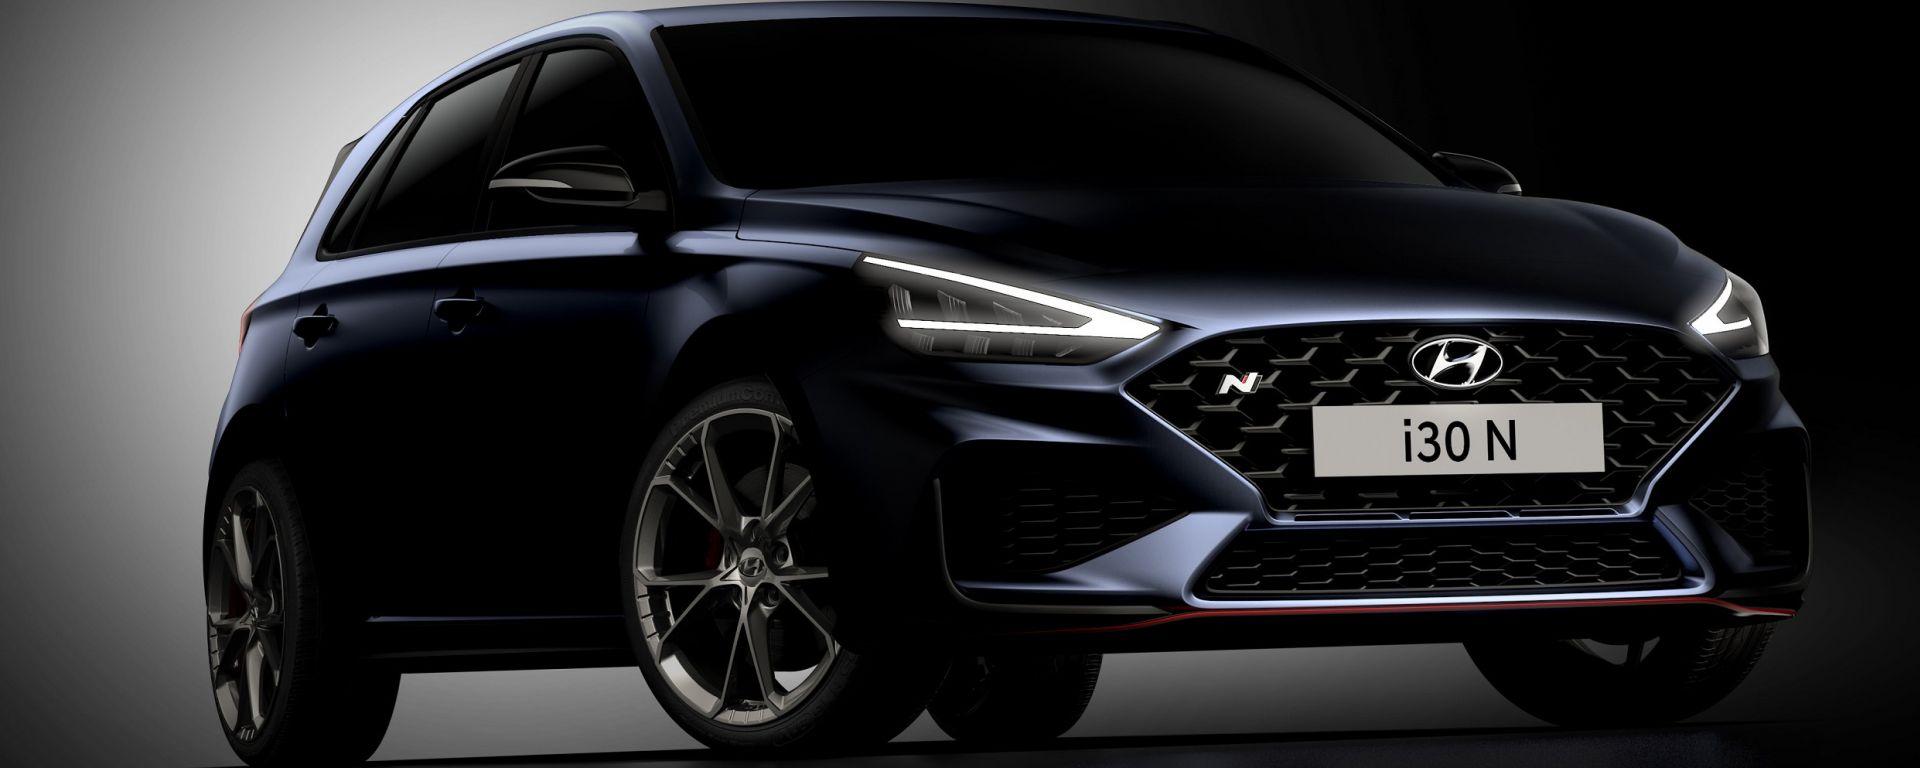 Nuova Hyundai i30 N, primi teaser